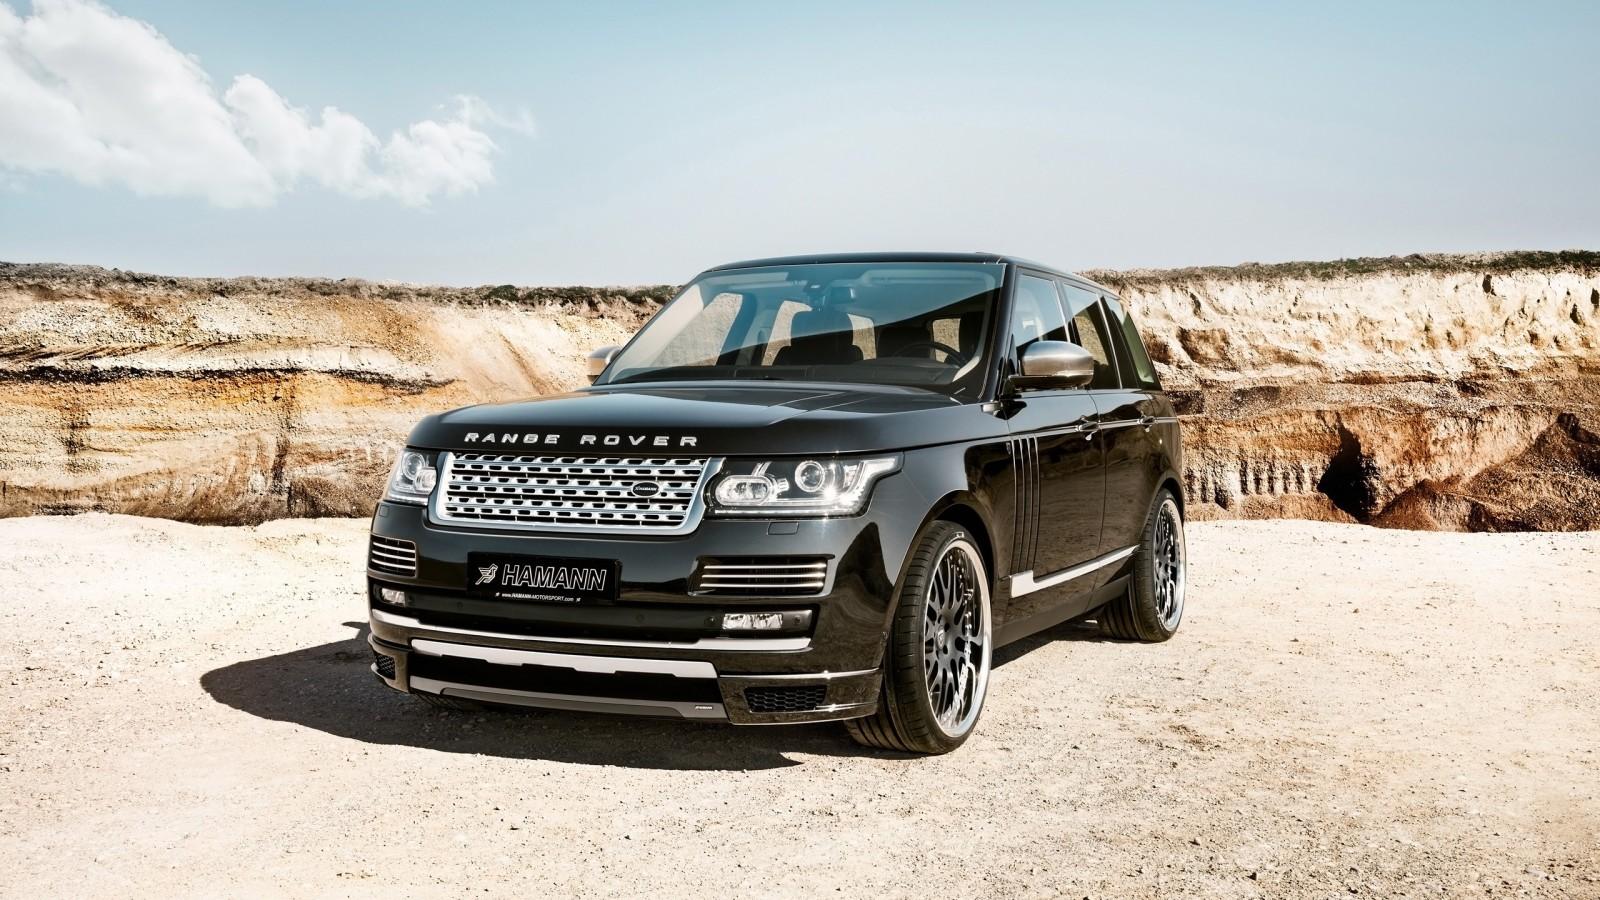 2014 Hamann Range Rover Vogue Wallpaper